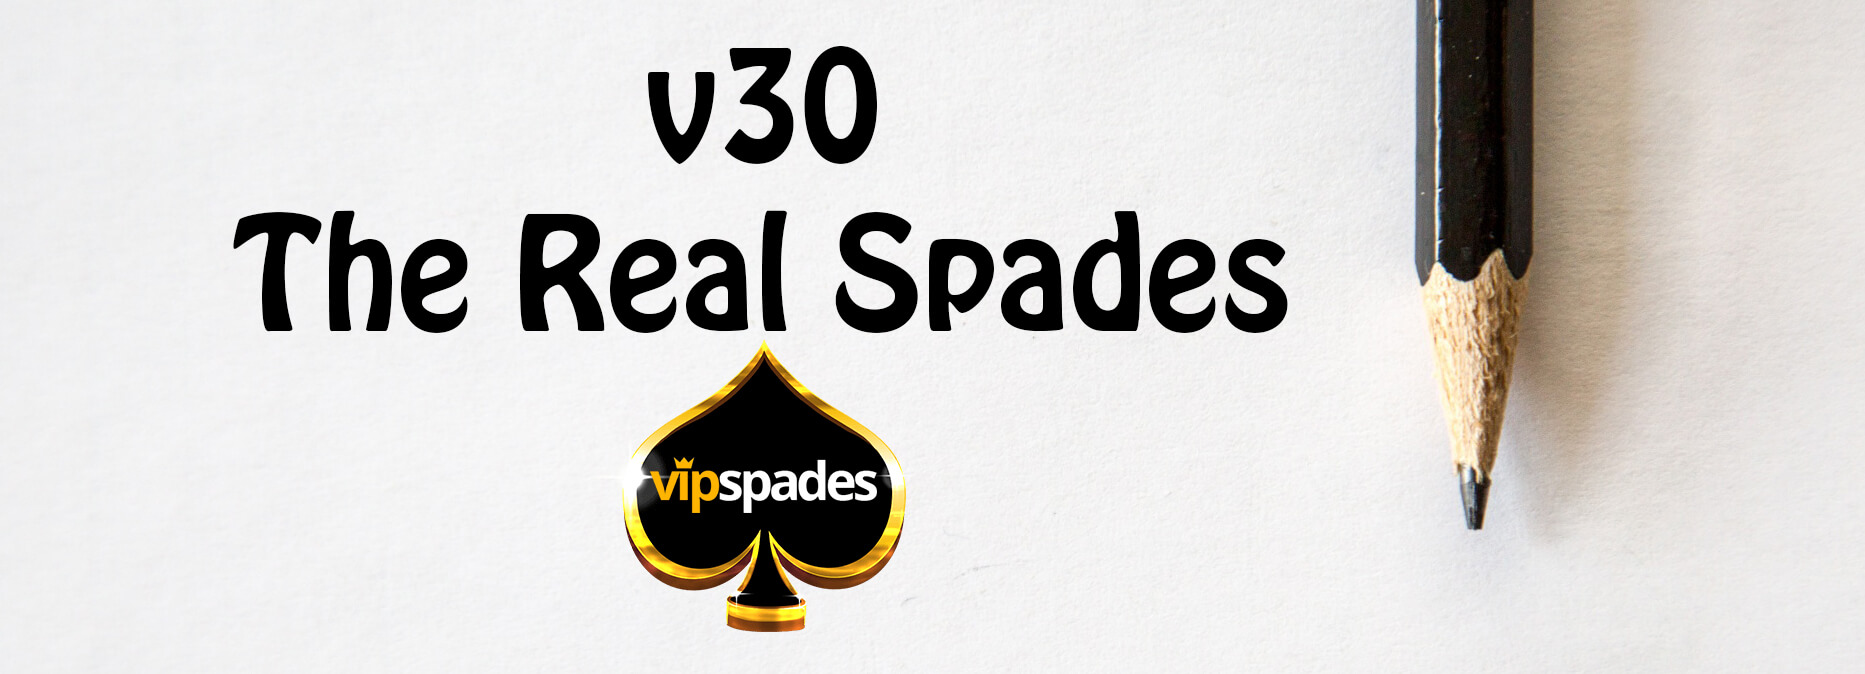 VIP Spades v30 Banner